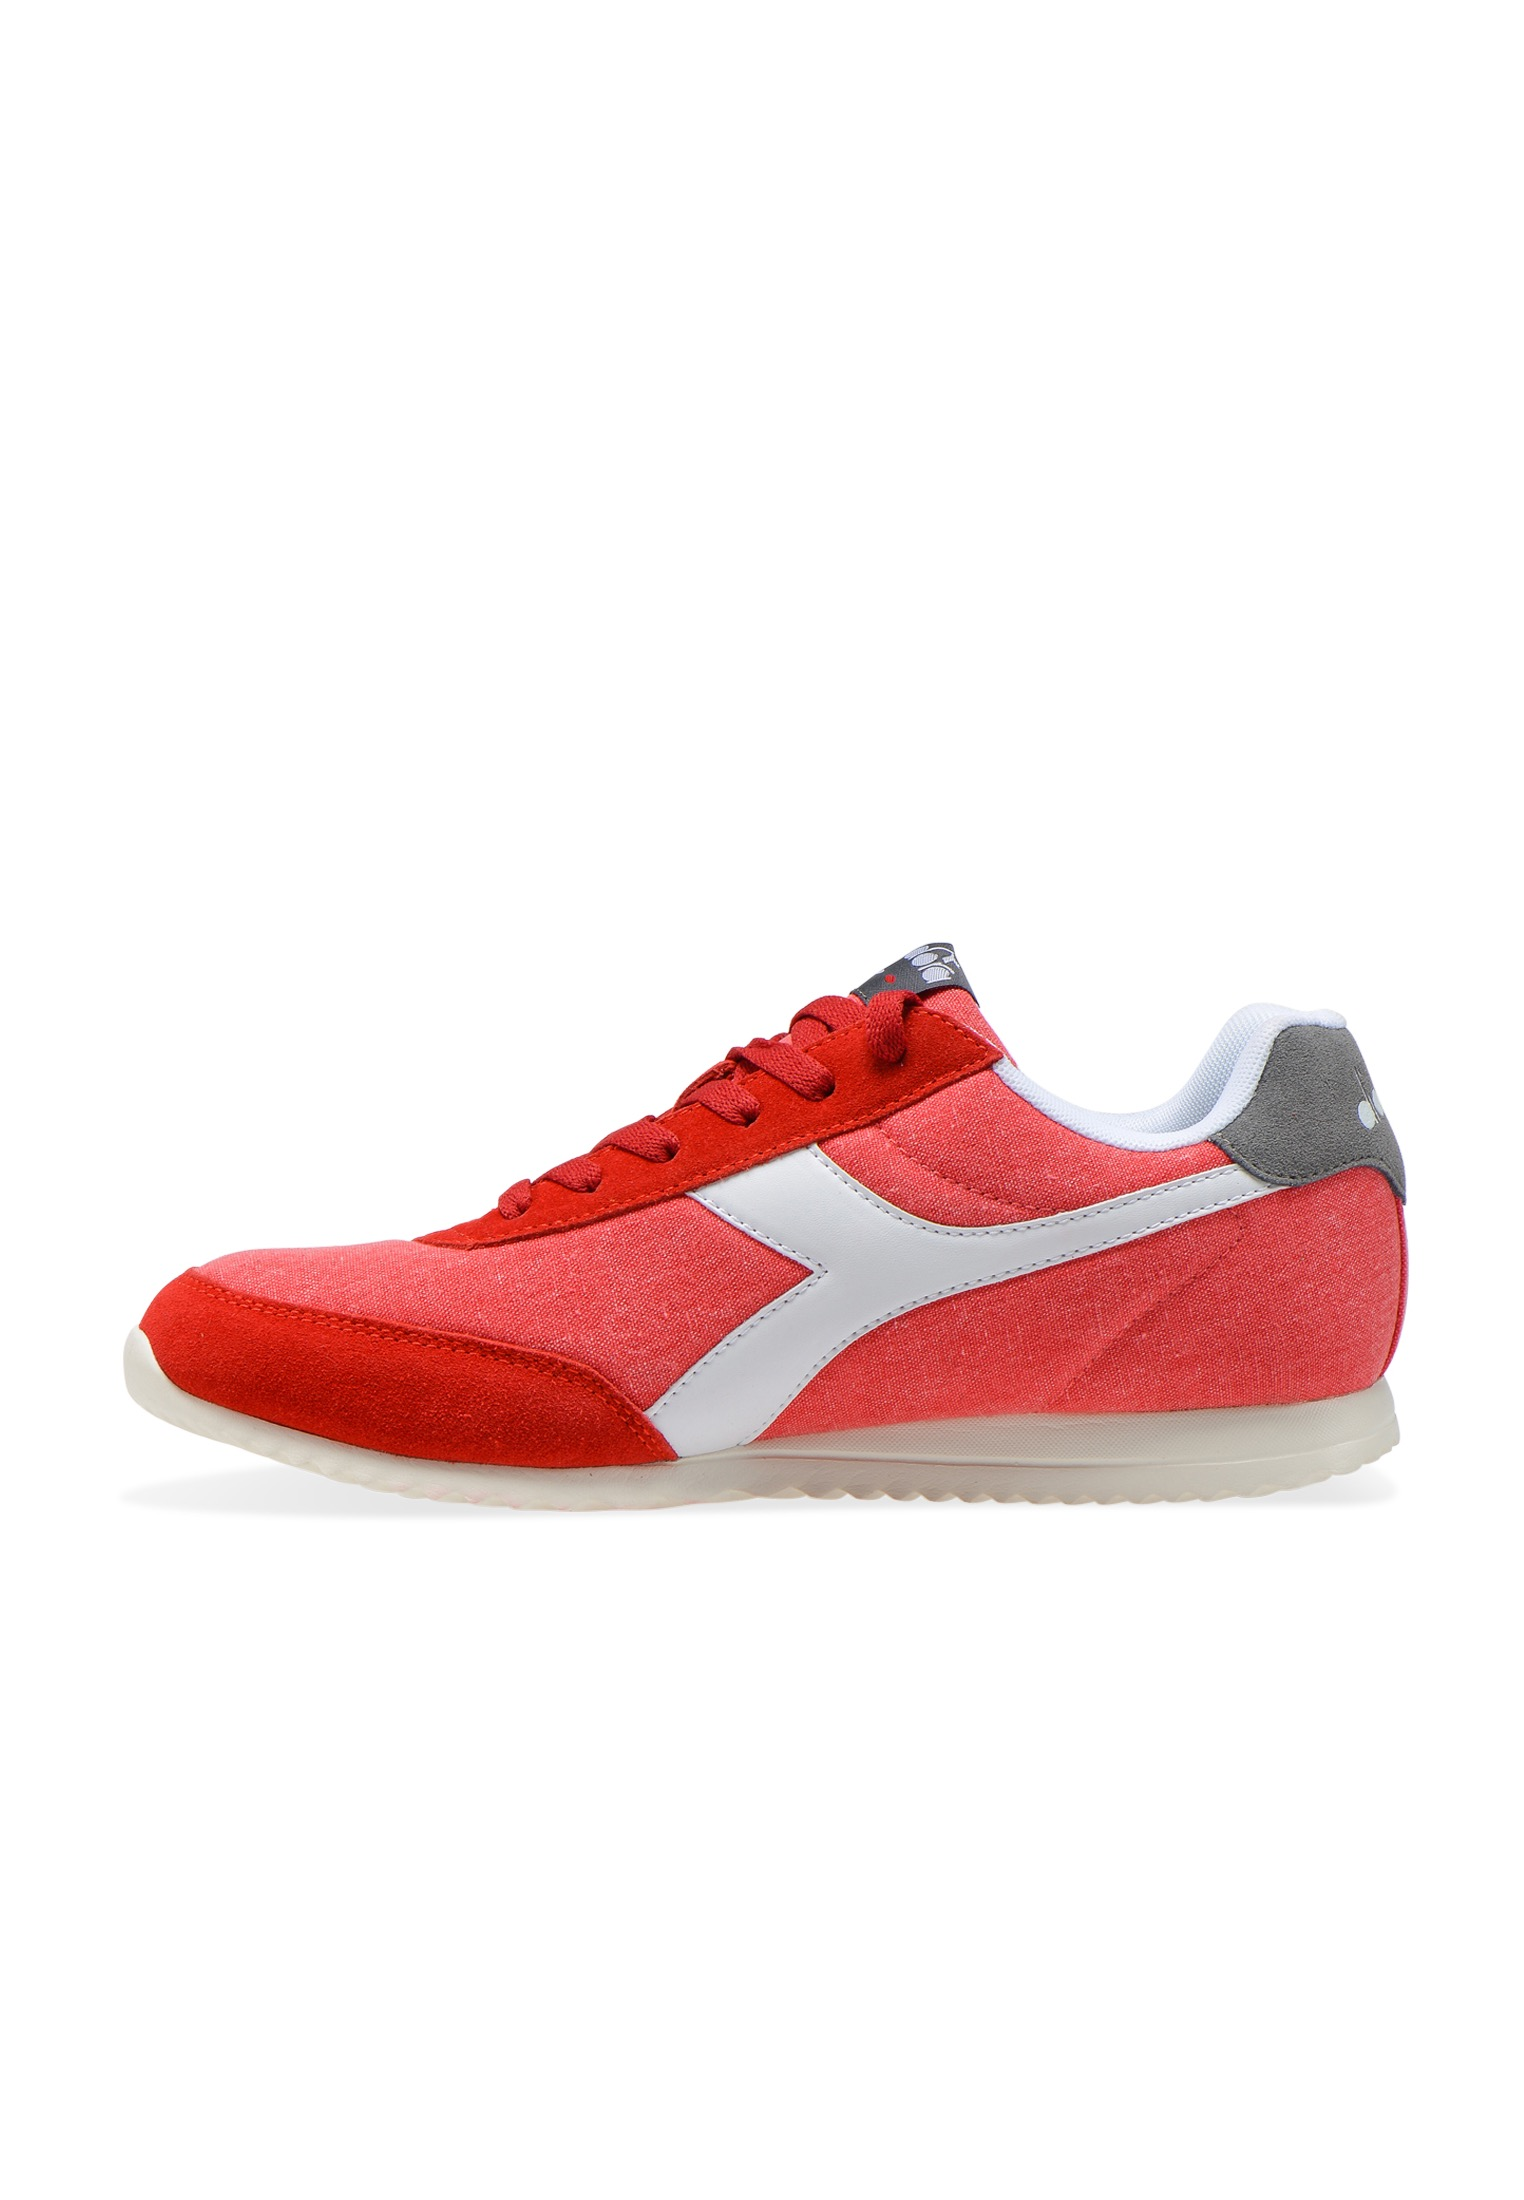 Scarpe-Diadora-Jog-Light-C-Sneakers-sportive-uomo-donna-vari-colori-e-taglie miniatura 87